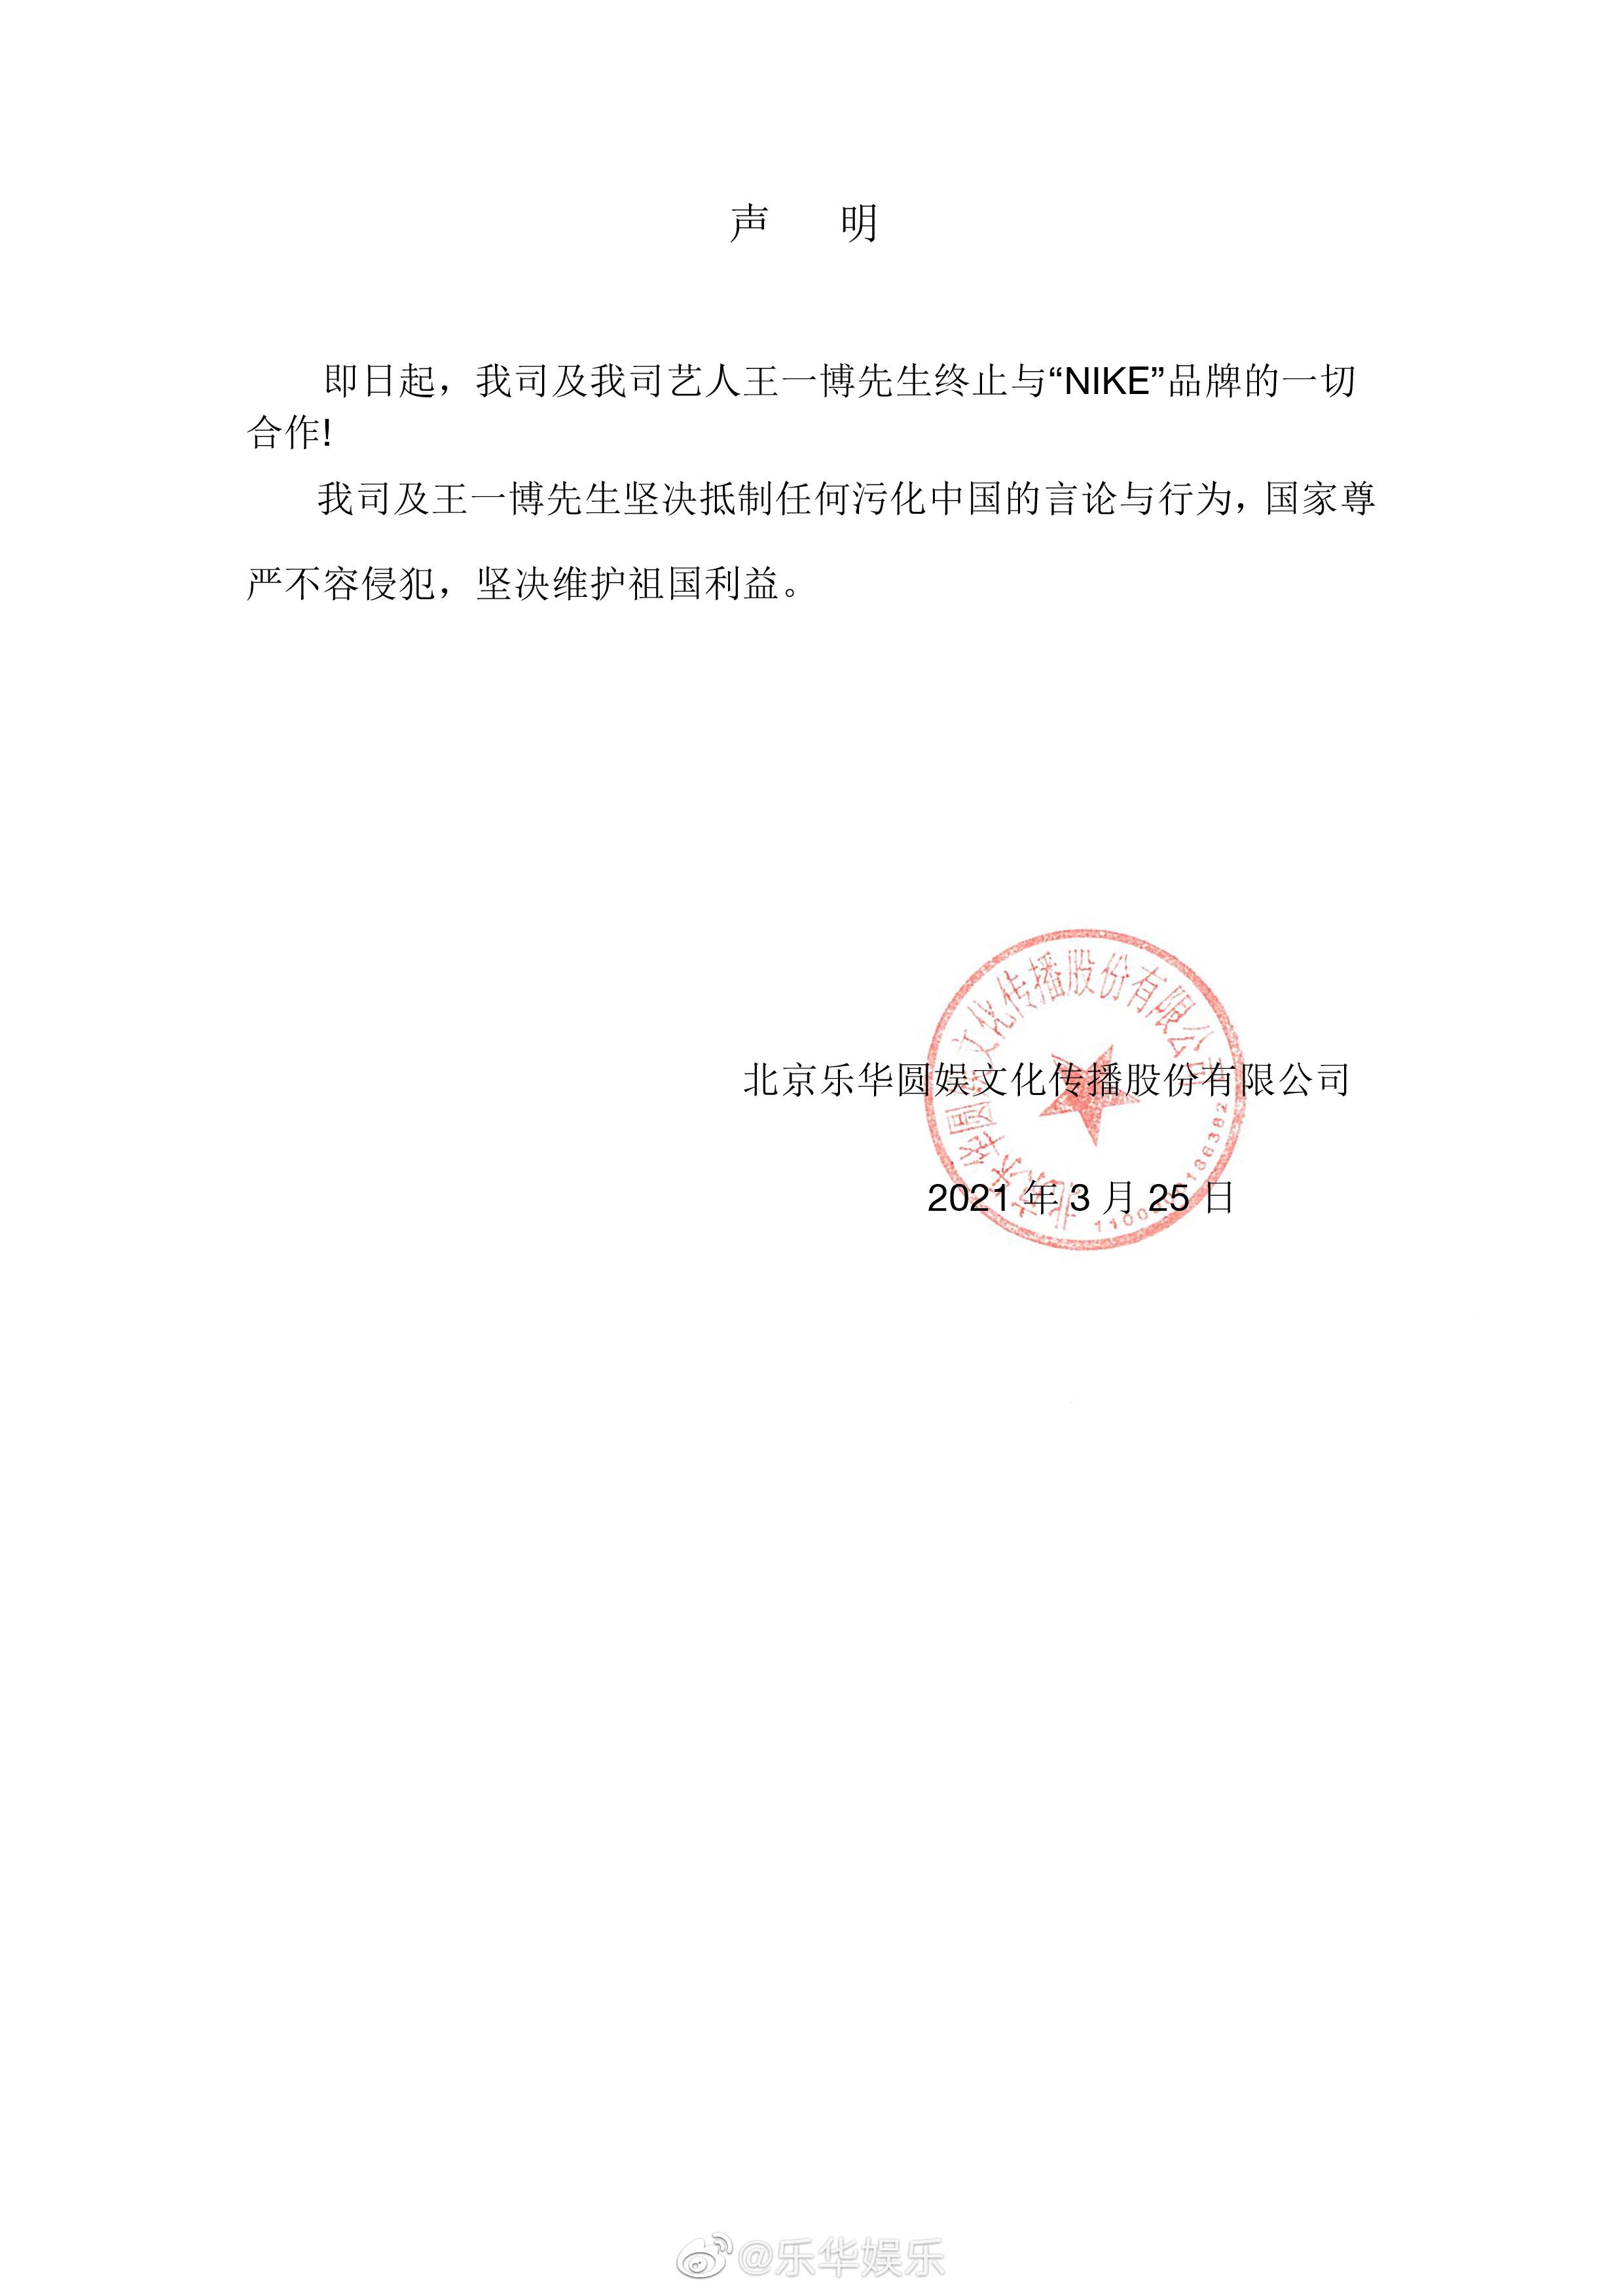 H&M、耐克抵制新疆棉花惹众怒 多位艺人已停止与其合作